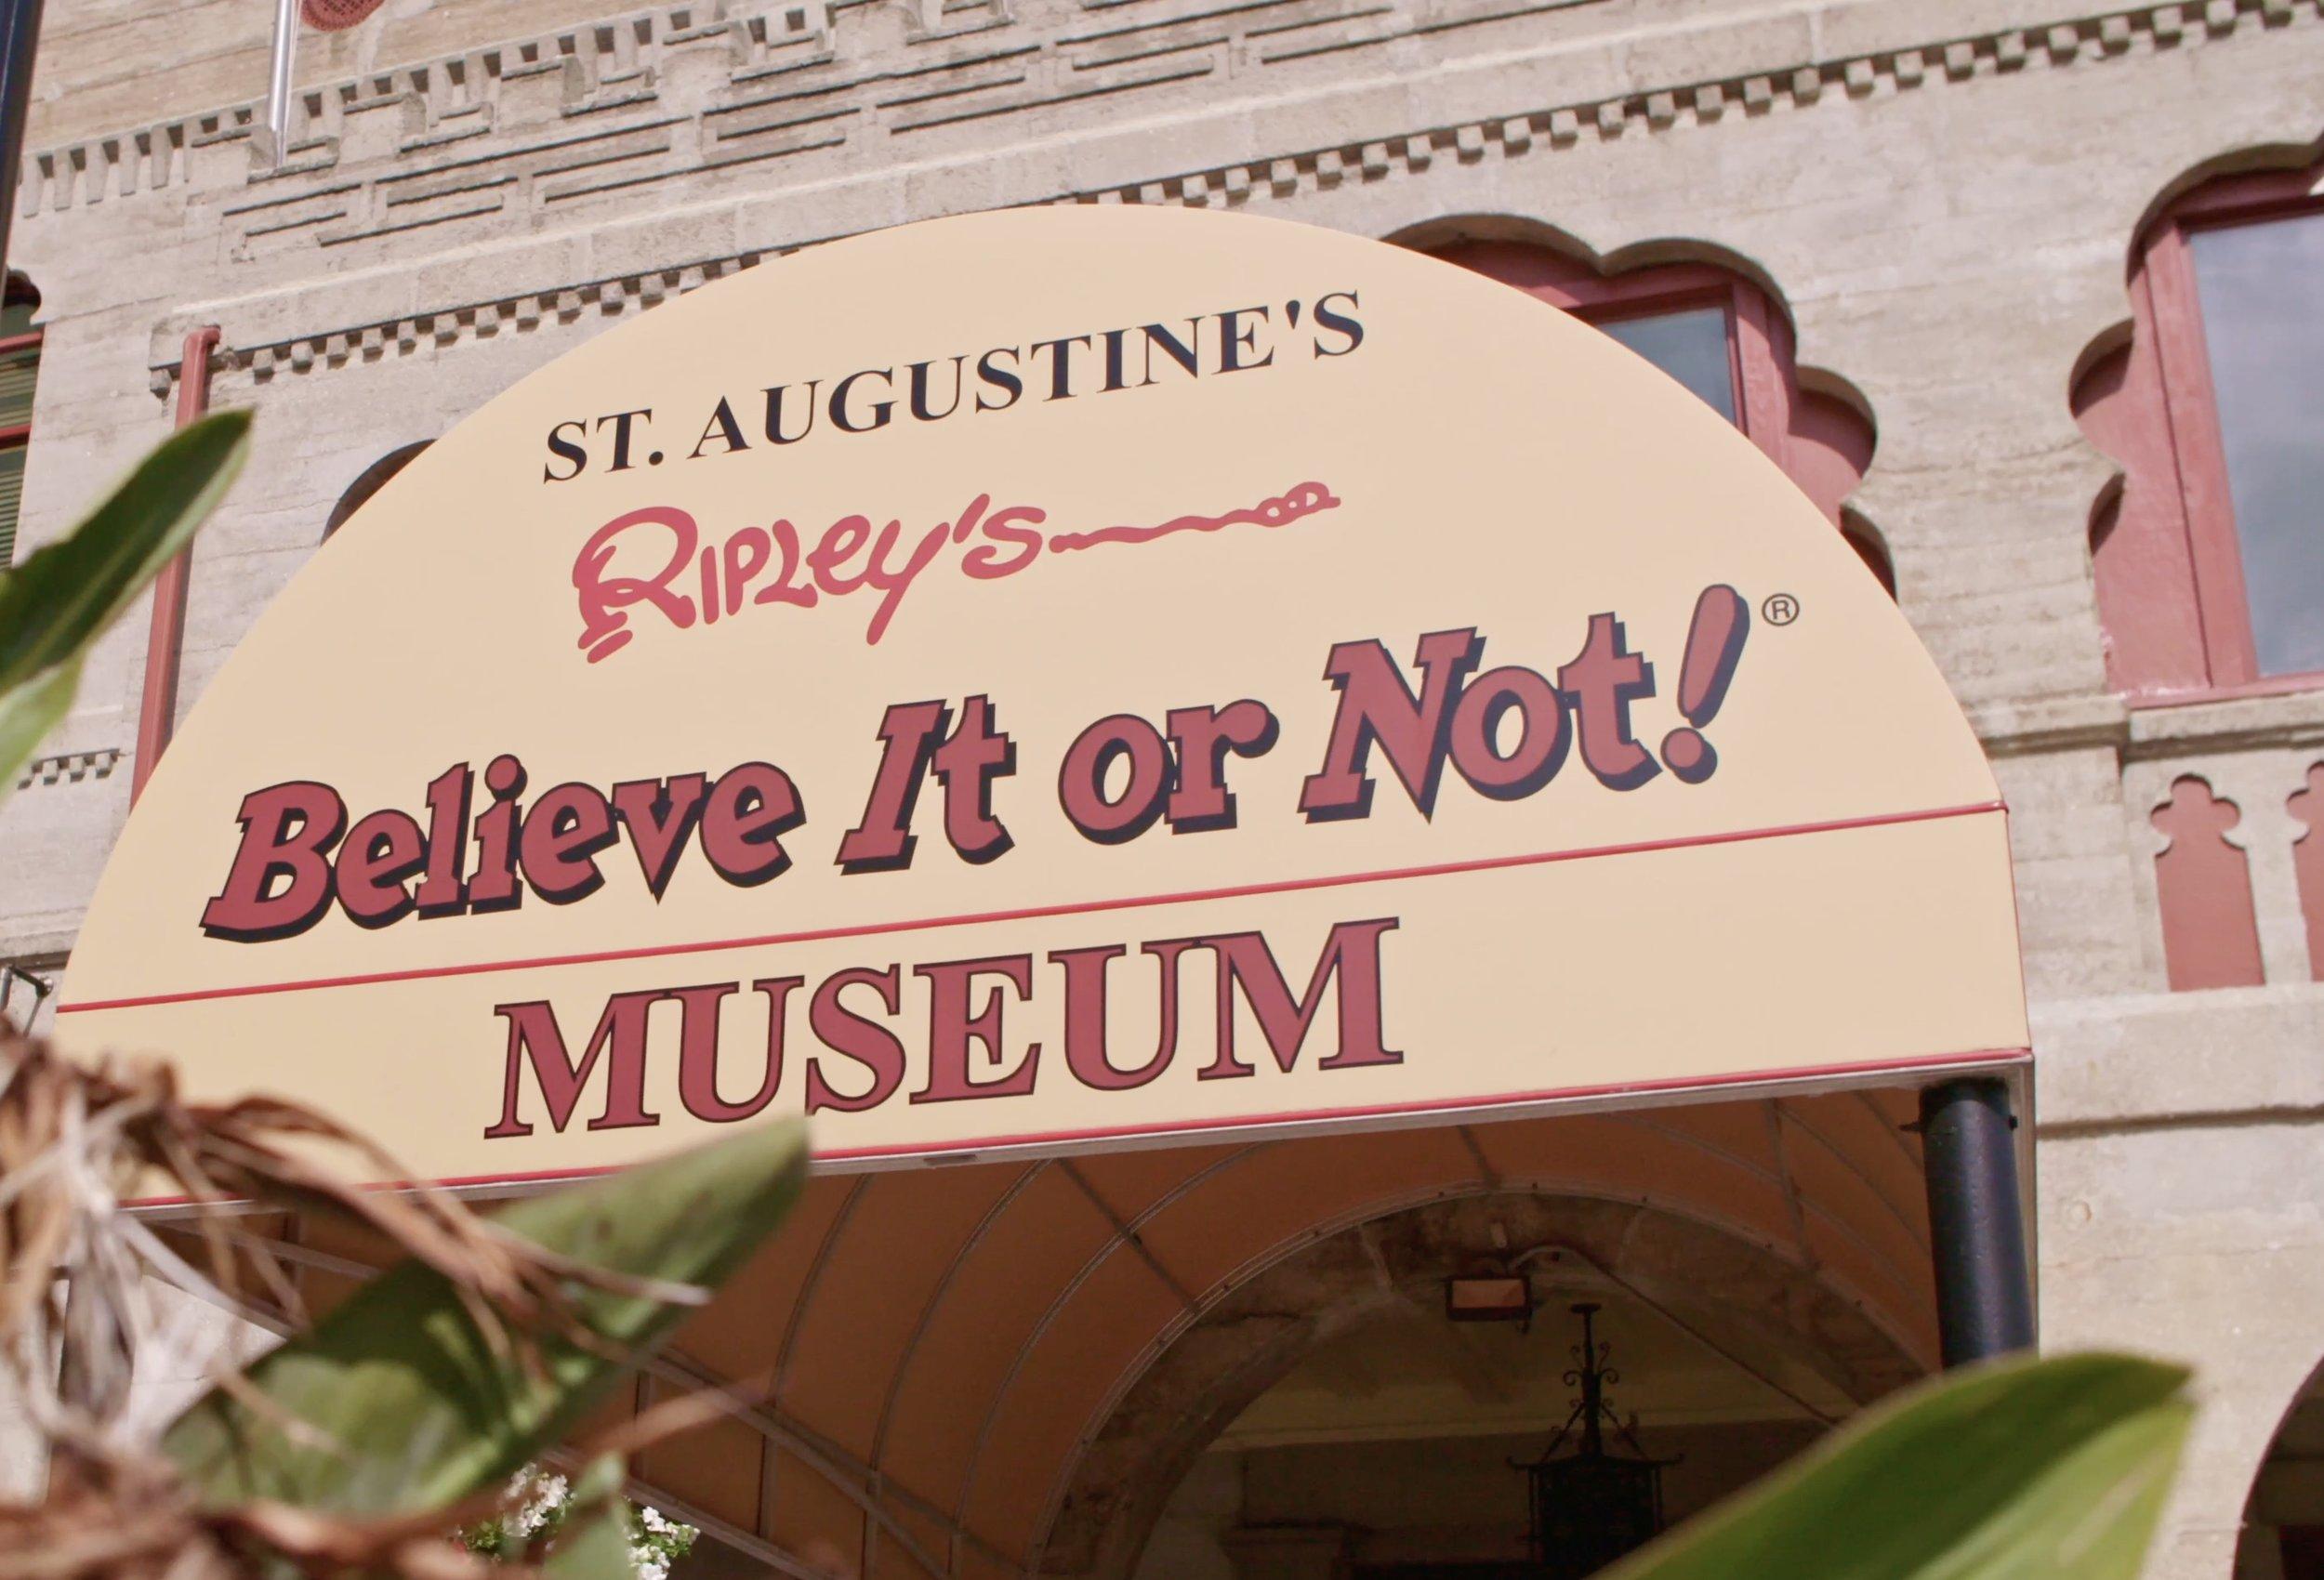 Ripley's Believe-It-or-Not! Odditorium